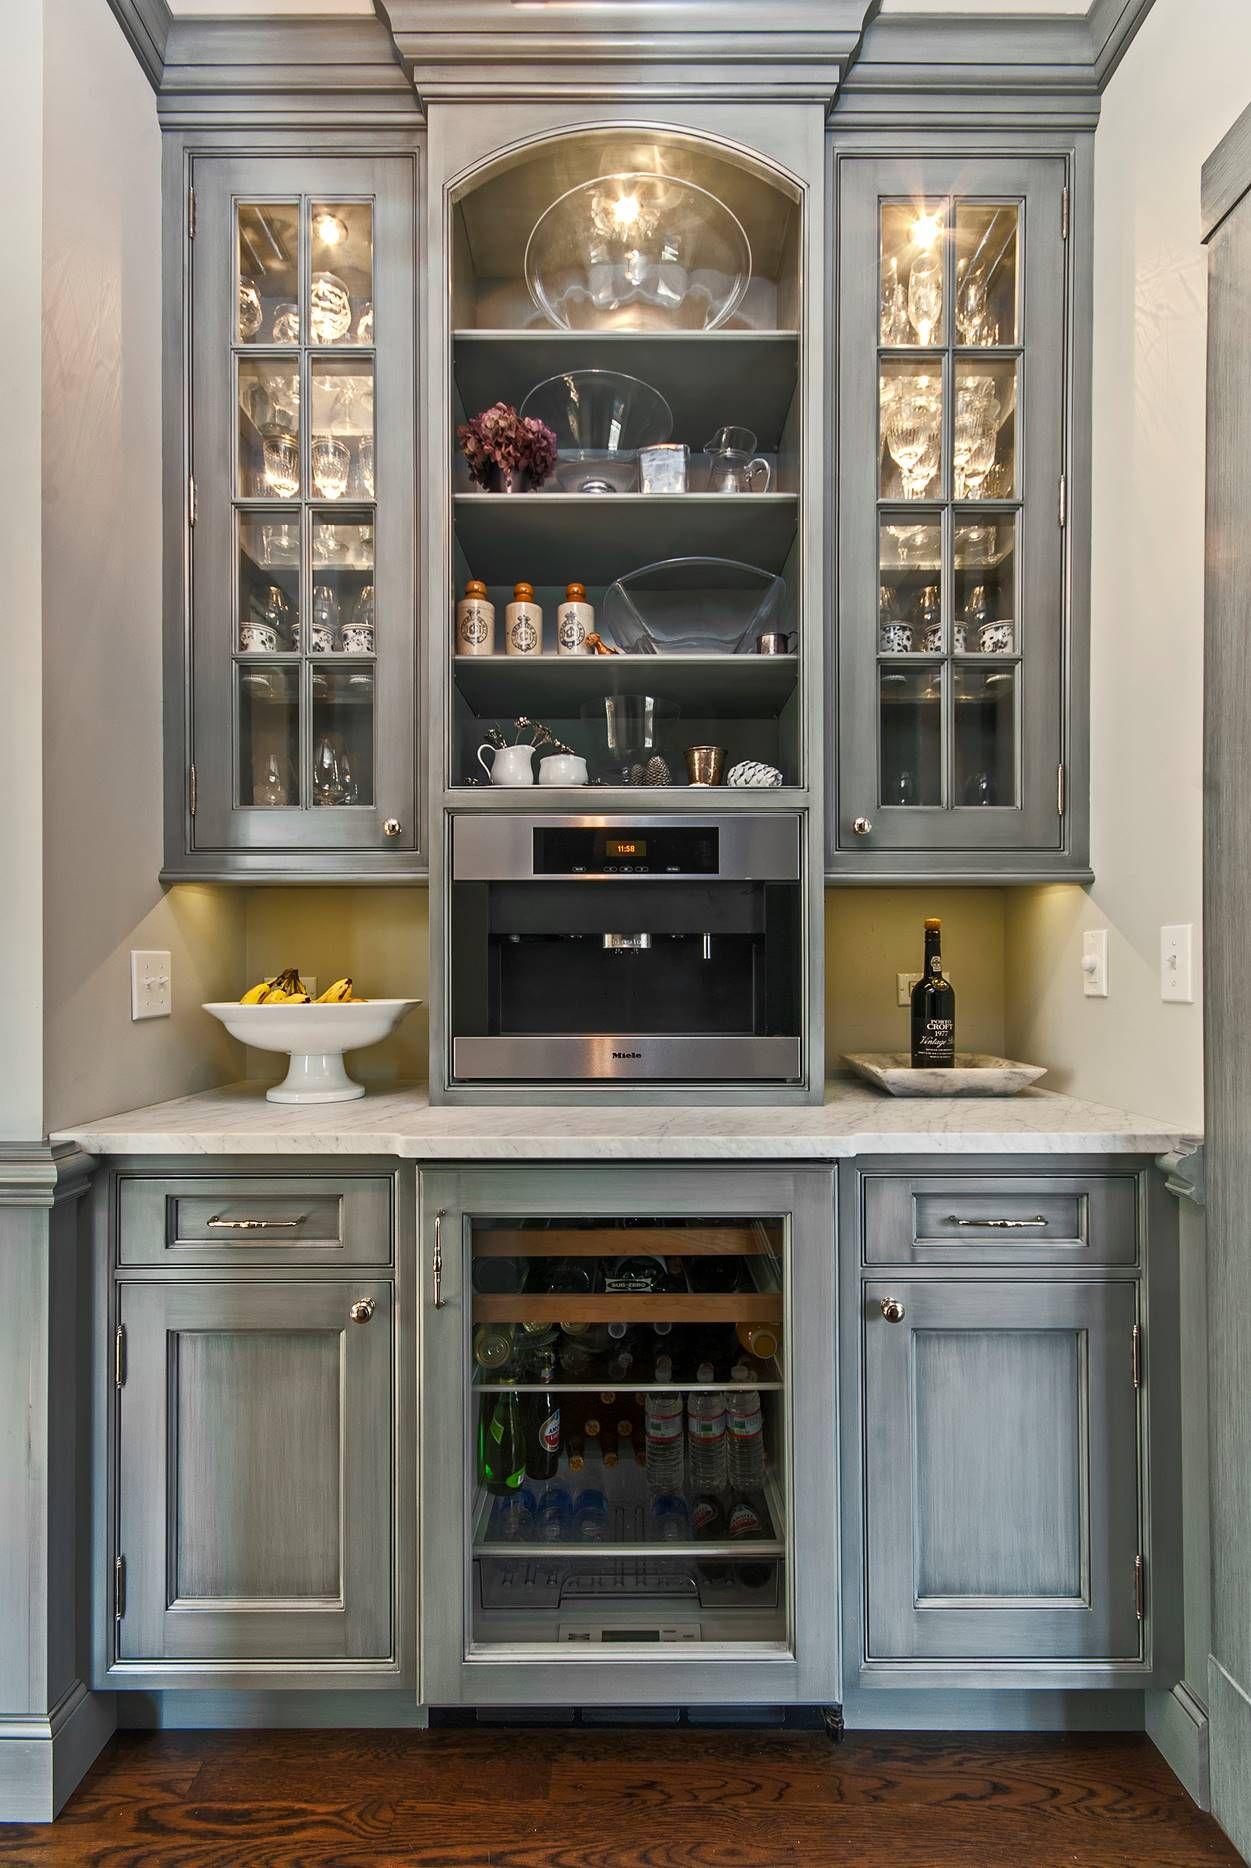 PB Kitchen Design coffee and beverage station.   Coffee ...